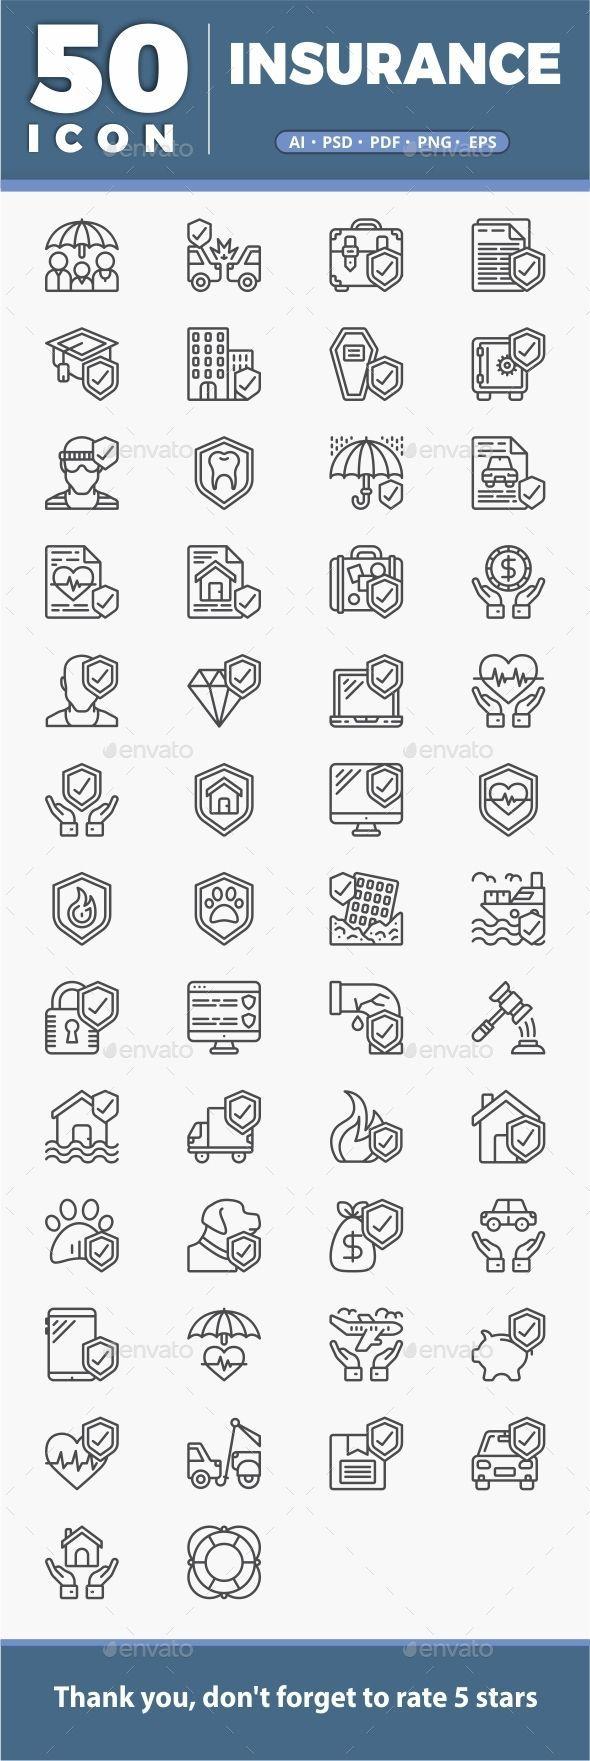 50 Insurance Symbol Fully Customizable Set Of Icons Icon Design Art Digitala Low Car Insurance Dental Insurance Umbrella Insurance Icon